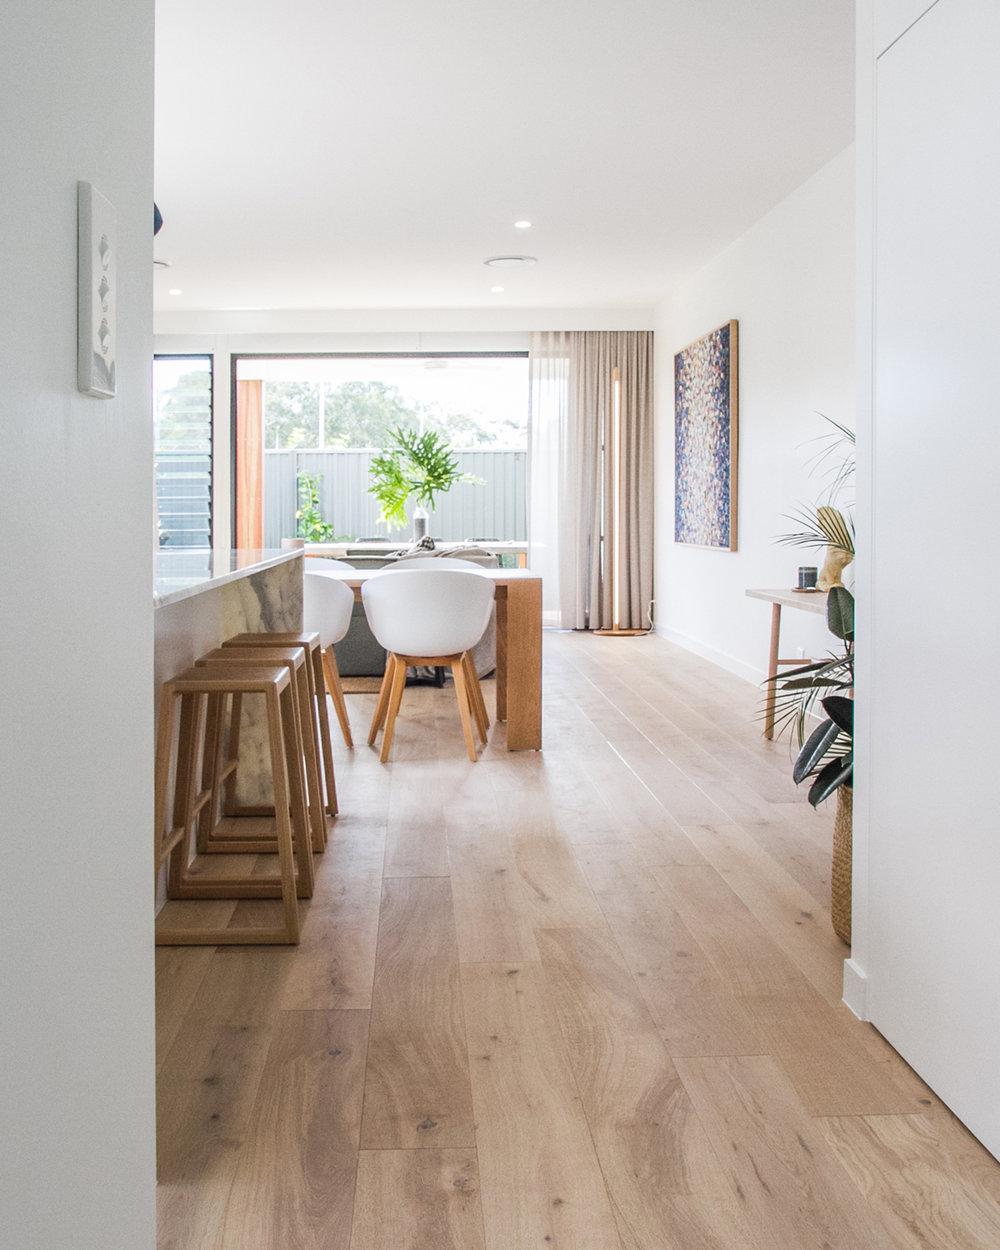 Kira and Kira - Gold Coast Property Styling - Home Interiors - Furniture DesignKira and Kira Gold Coast Property Styling Home Furniture IMG_6130 - small.jpg